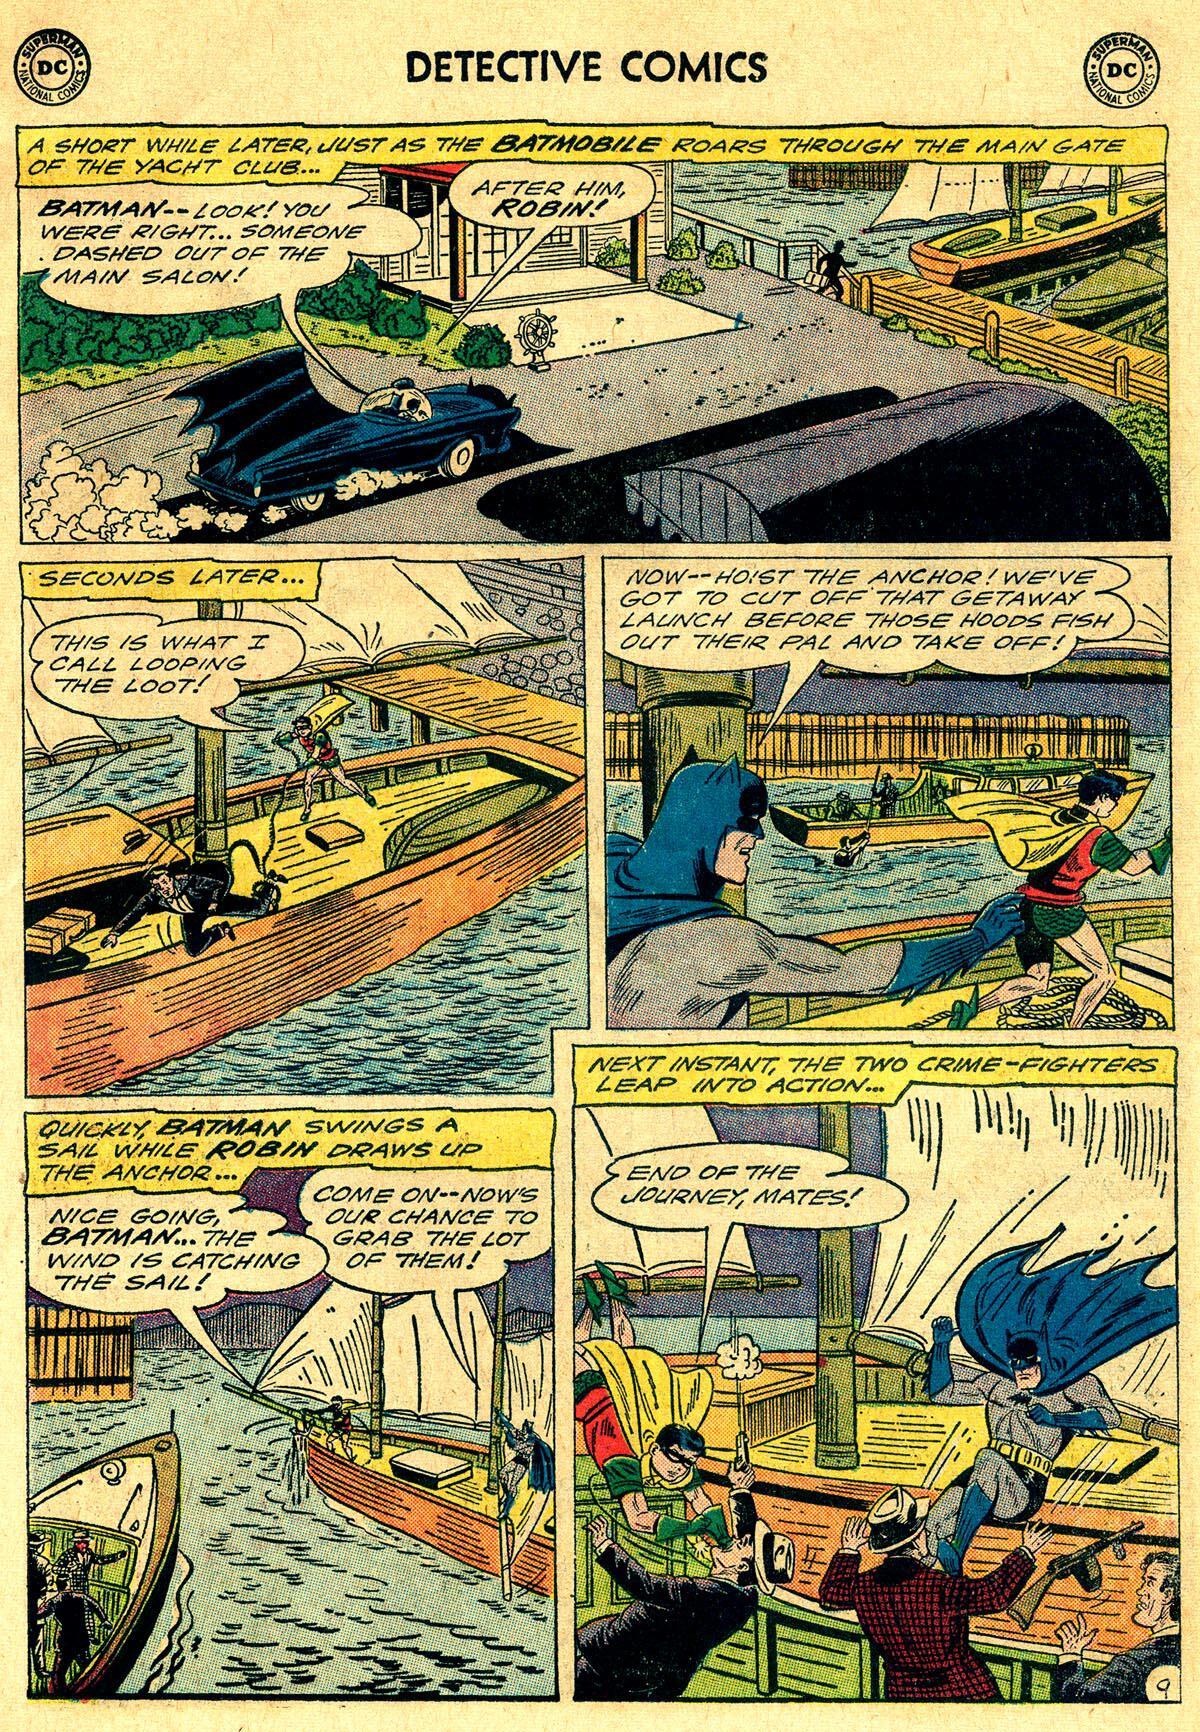 Detective Comics (1937) 302 Page 10